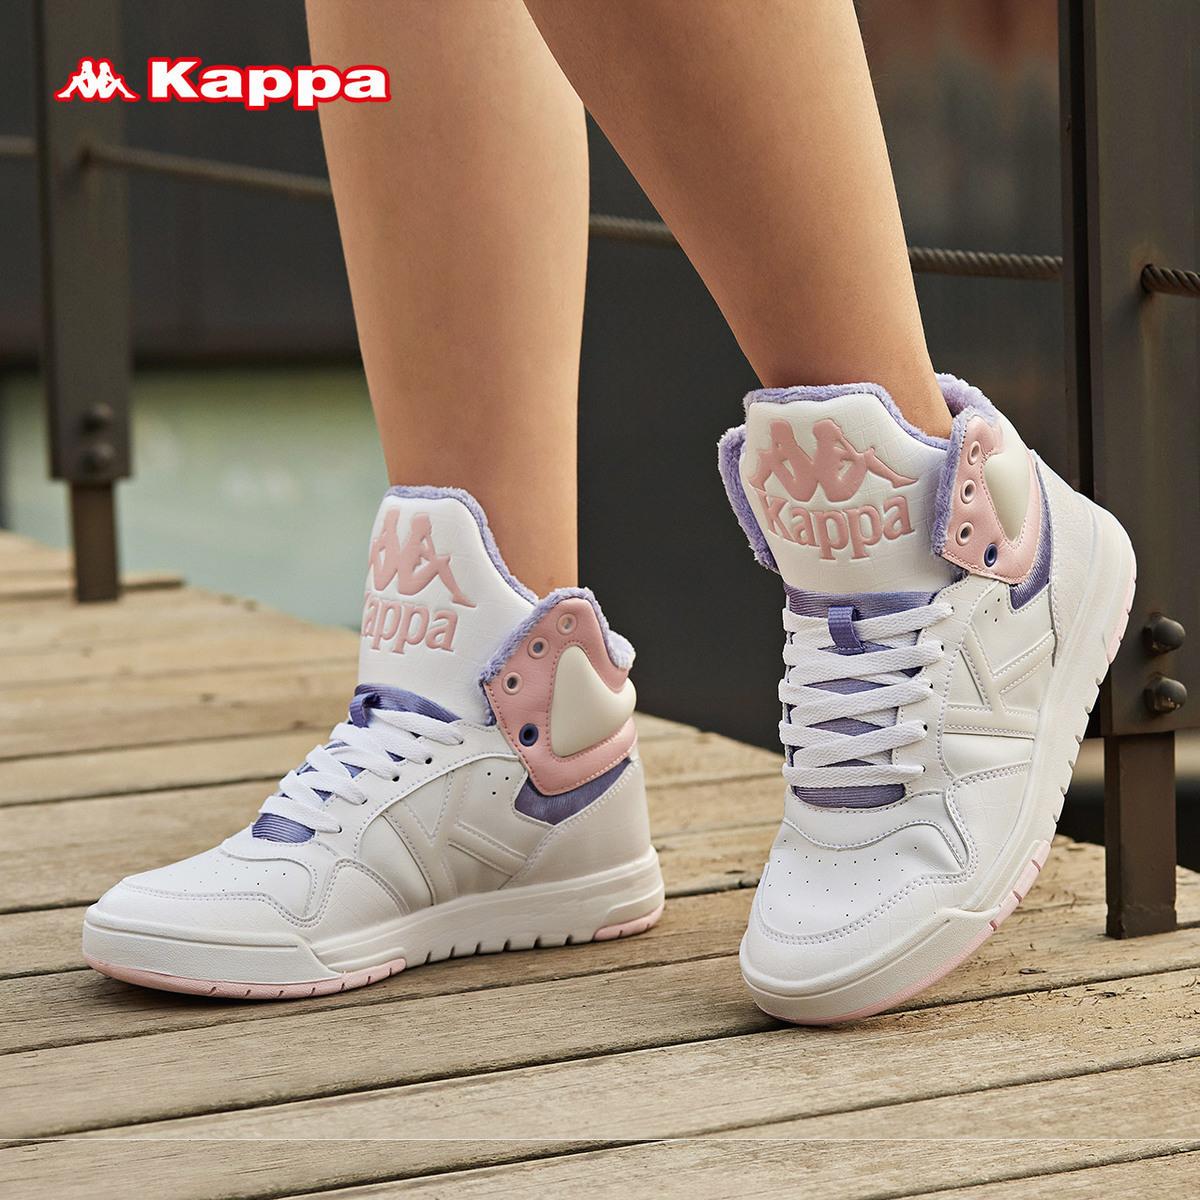 Kappa/背靠背卡帕女款運動板鞋休閑鞋小白鞋 運動鞋 K0765CC12